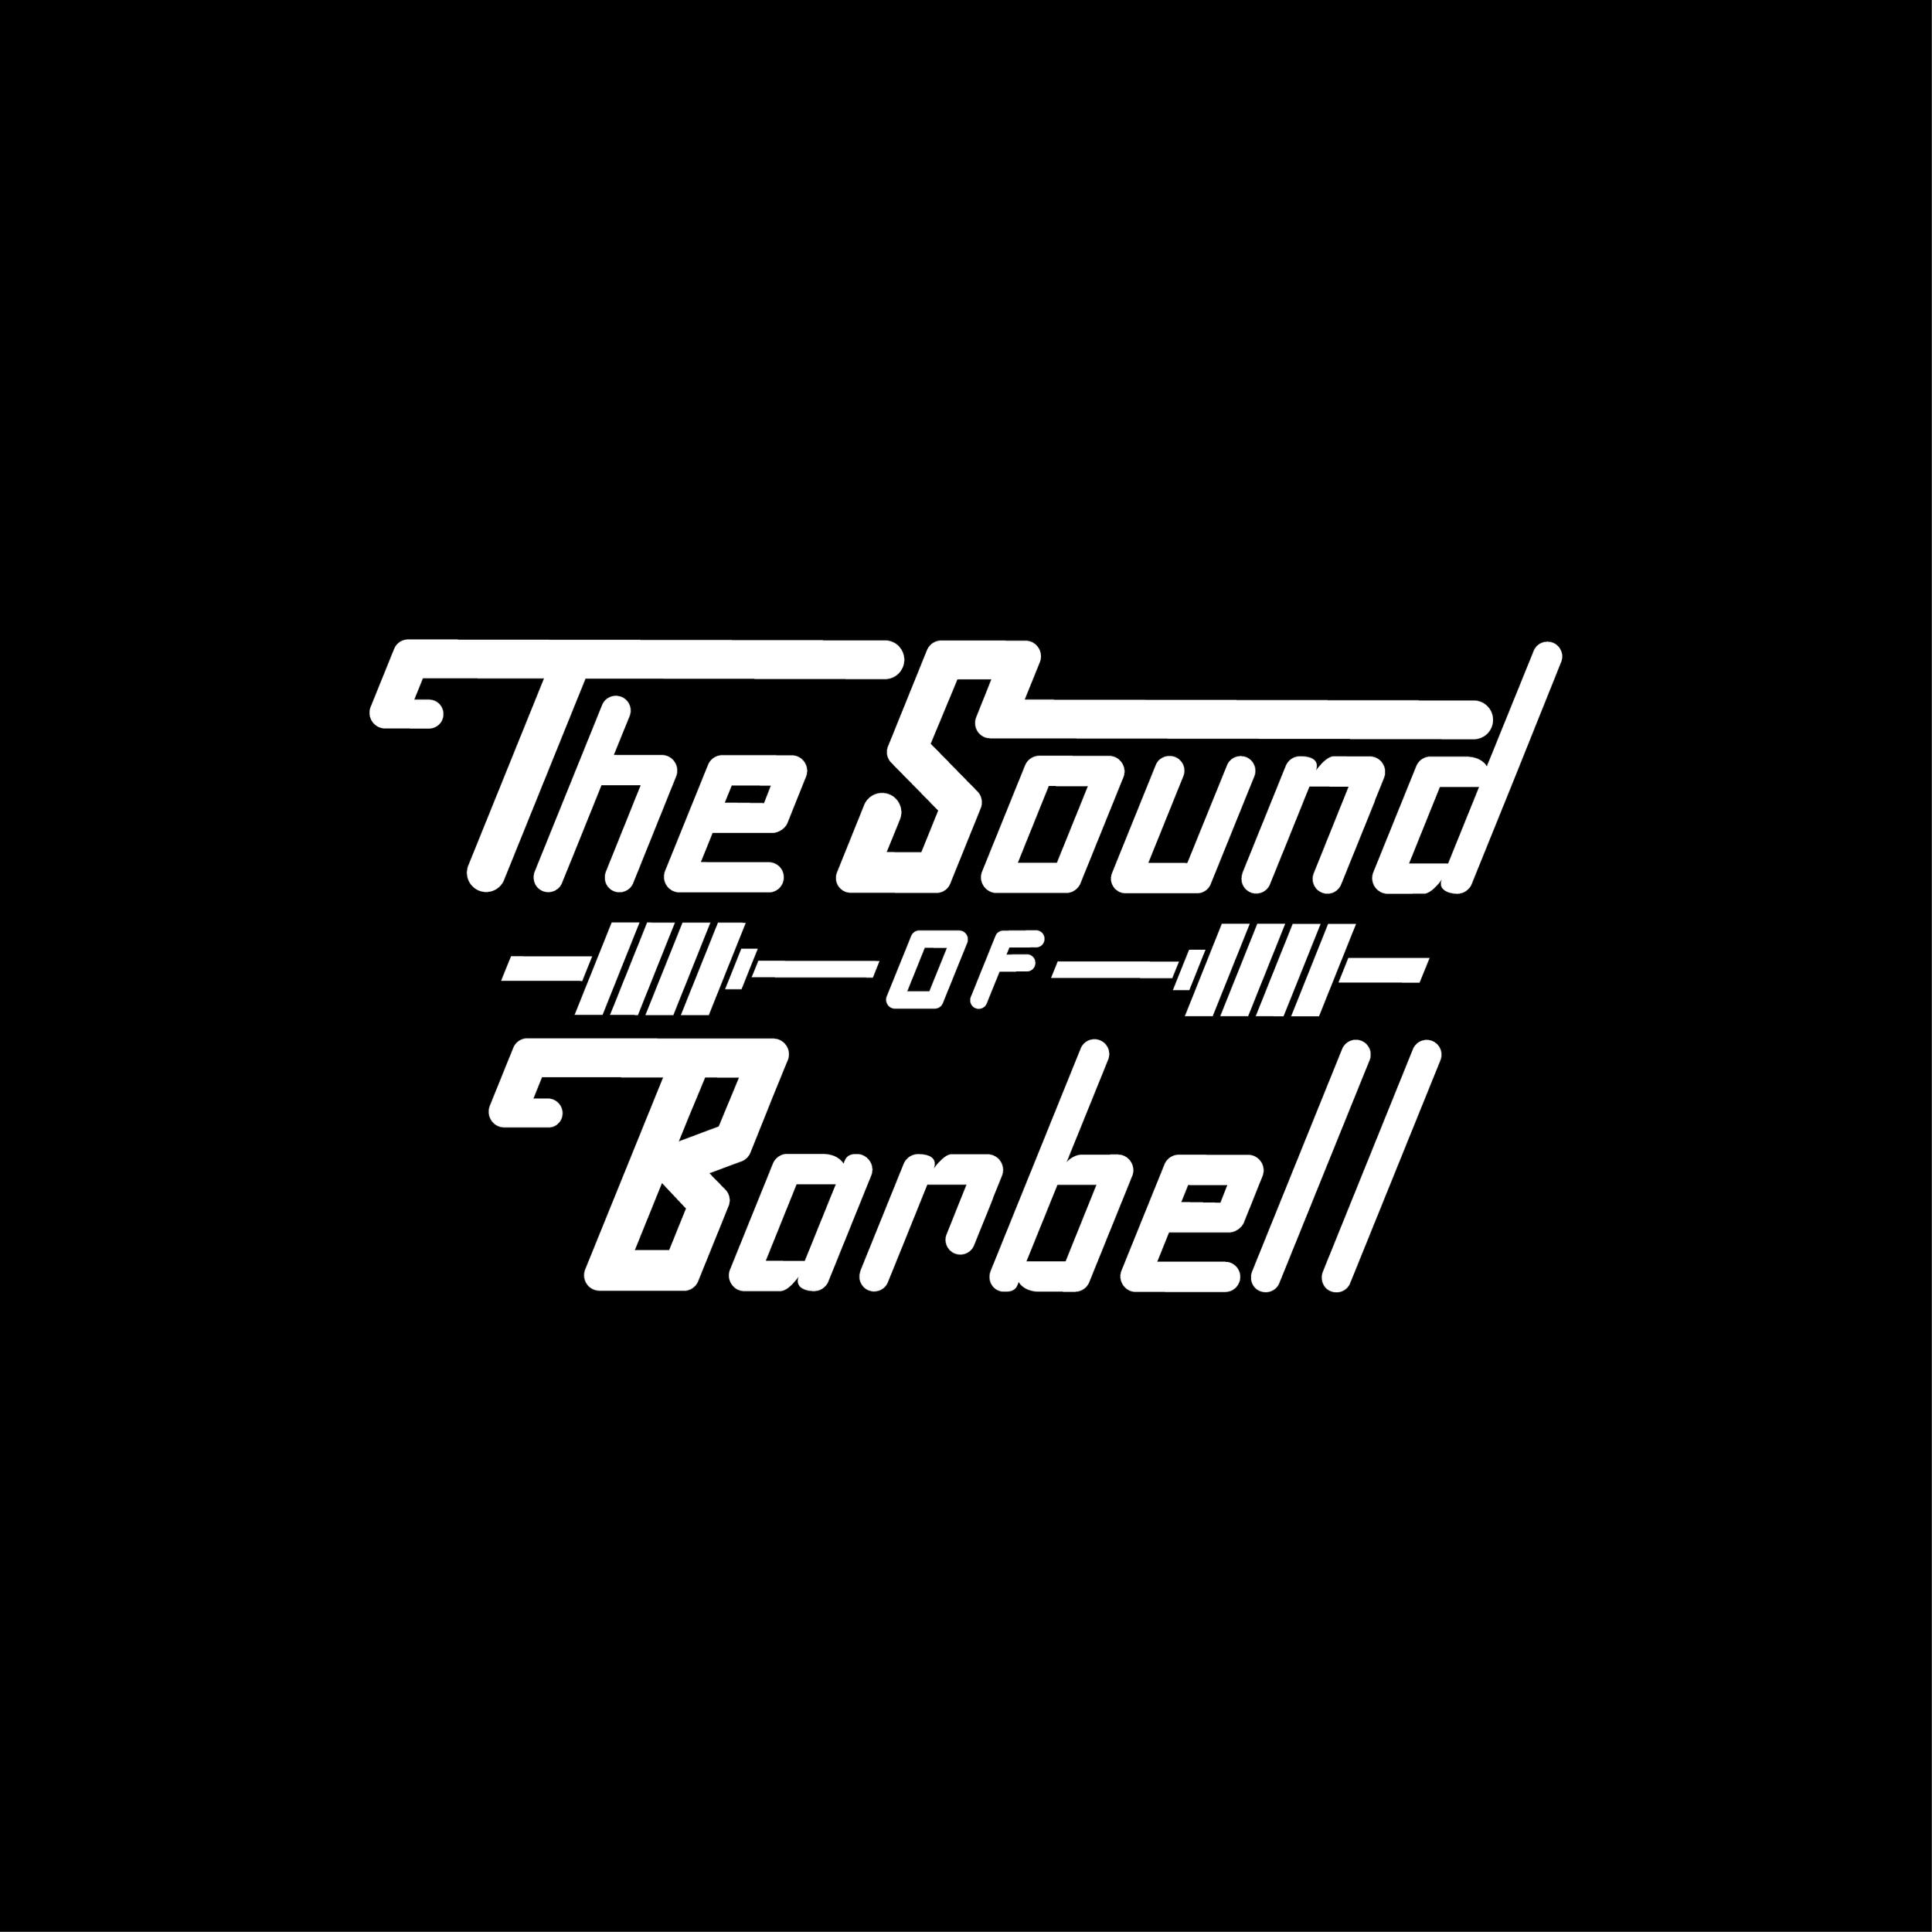 tsob-thesoundofbarbell-logo-brand-branding-black-white-vector-design-graphic-graphicdesign-lasvegas-graphicdesigner-vector-handtype-handletter-logos-minimal-lgogtype.jpg